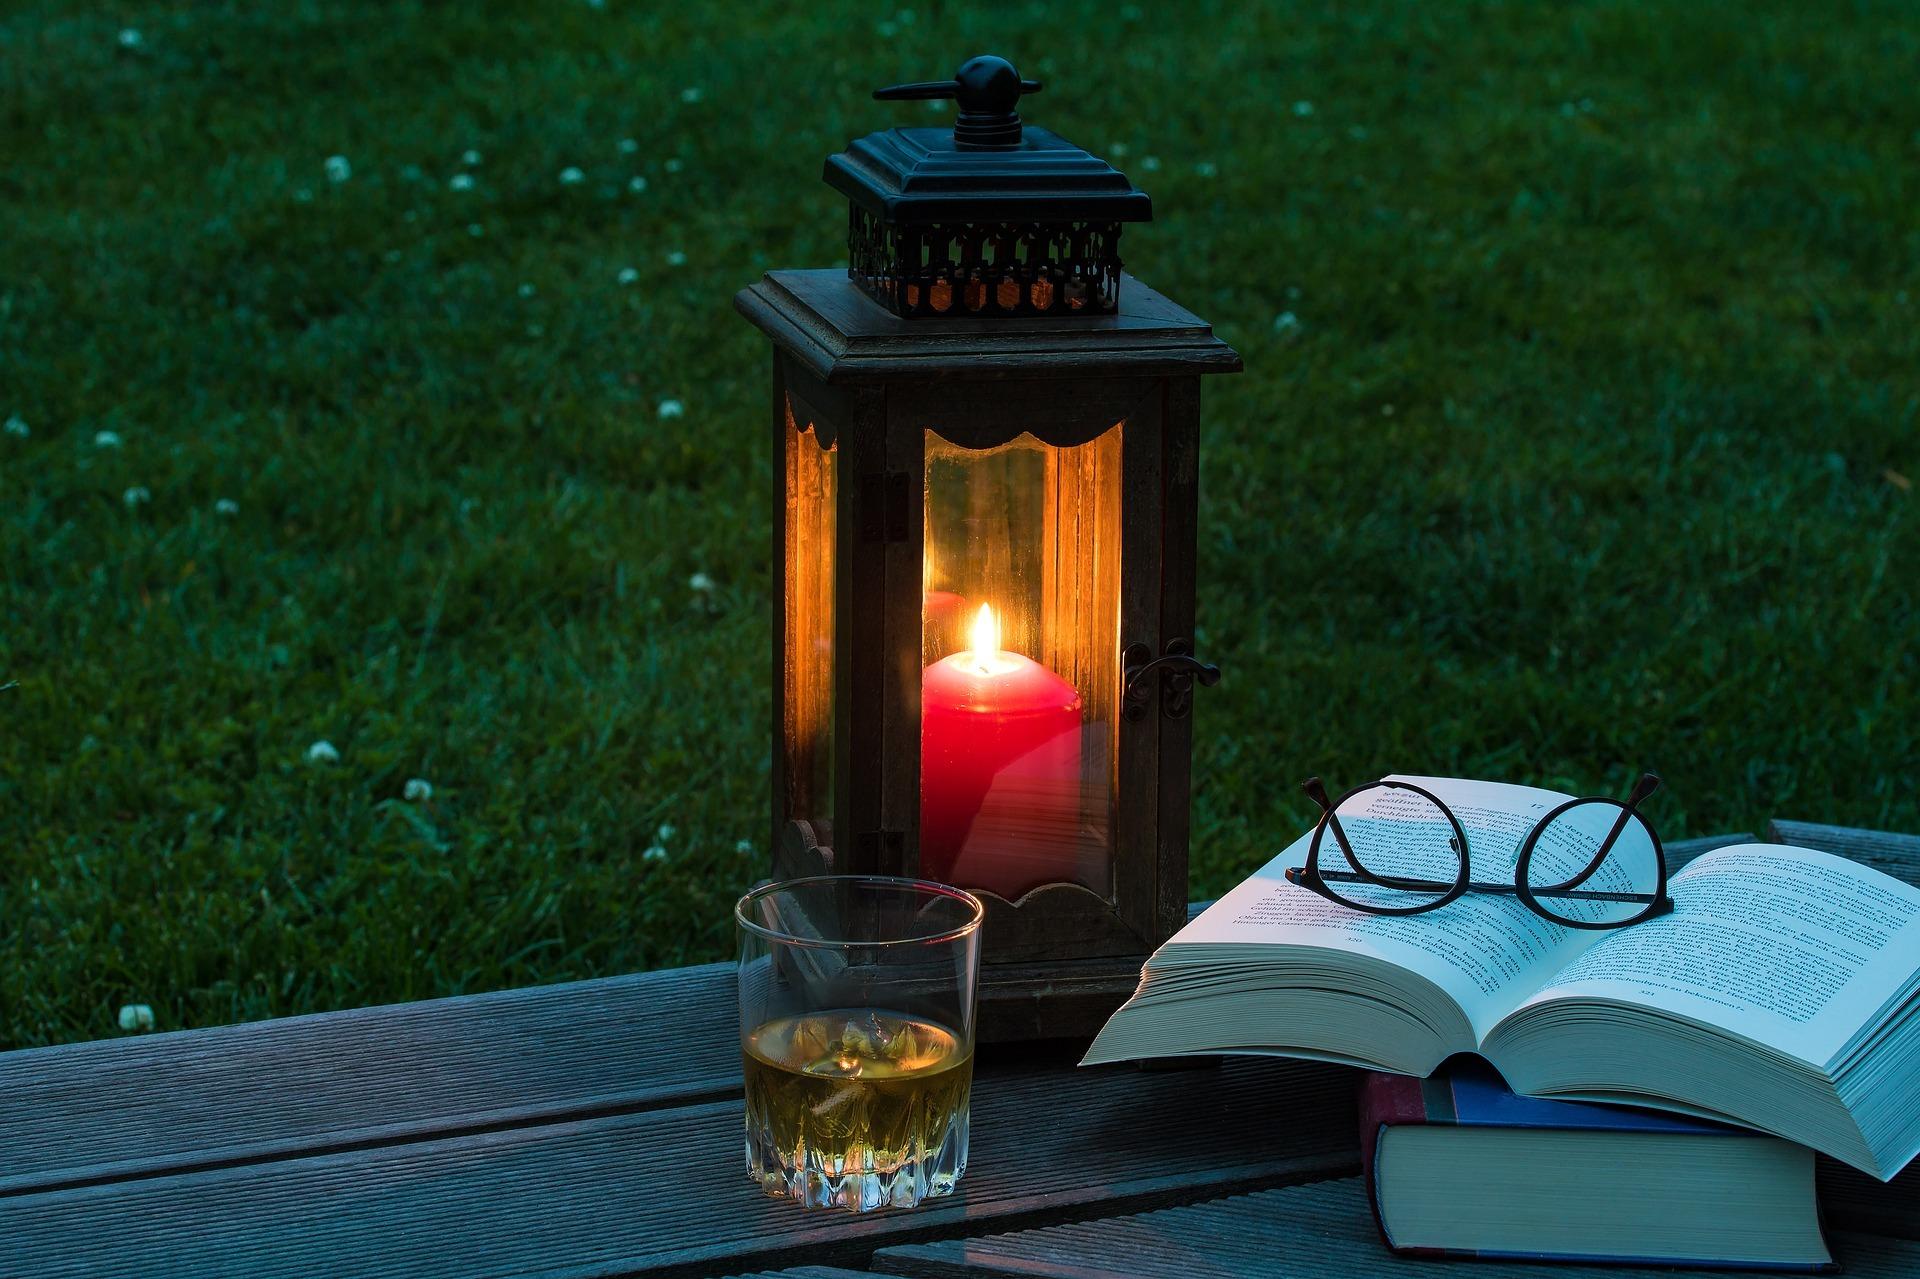 lantern-2369904_1920.jpg